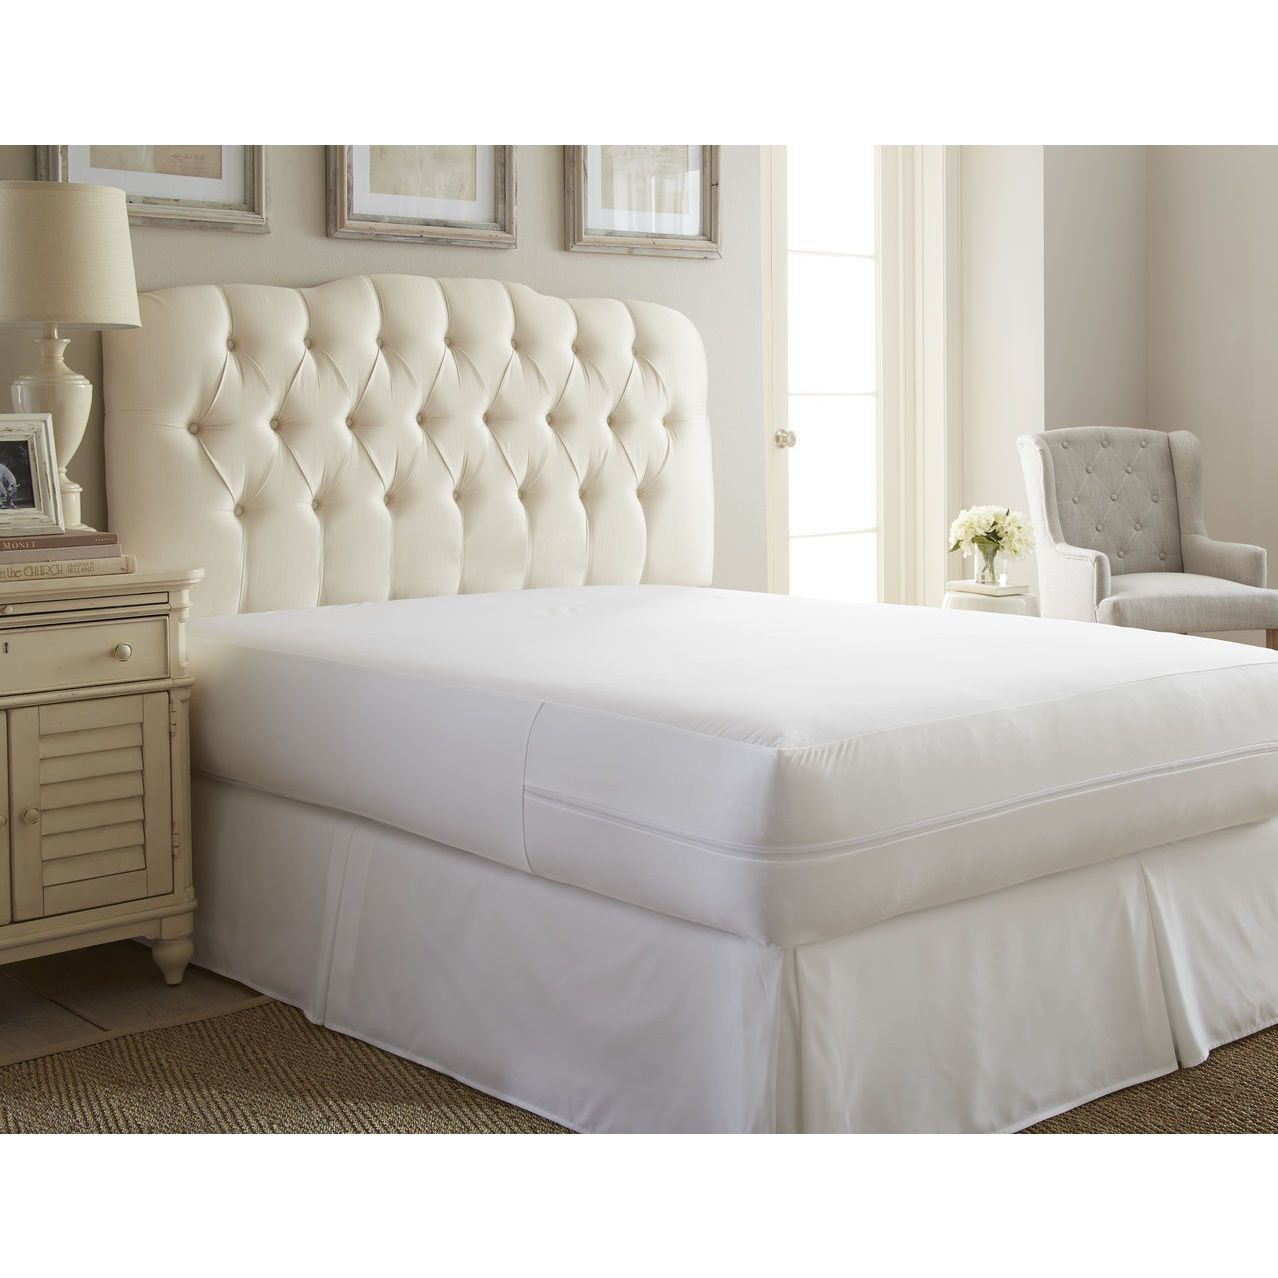 The Final Grab Inc. Ultra Soft Bed Bug Zipper